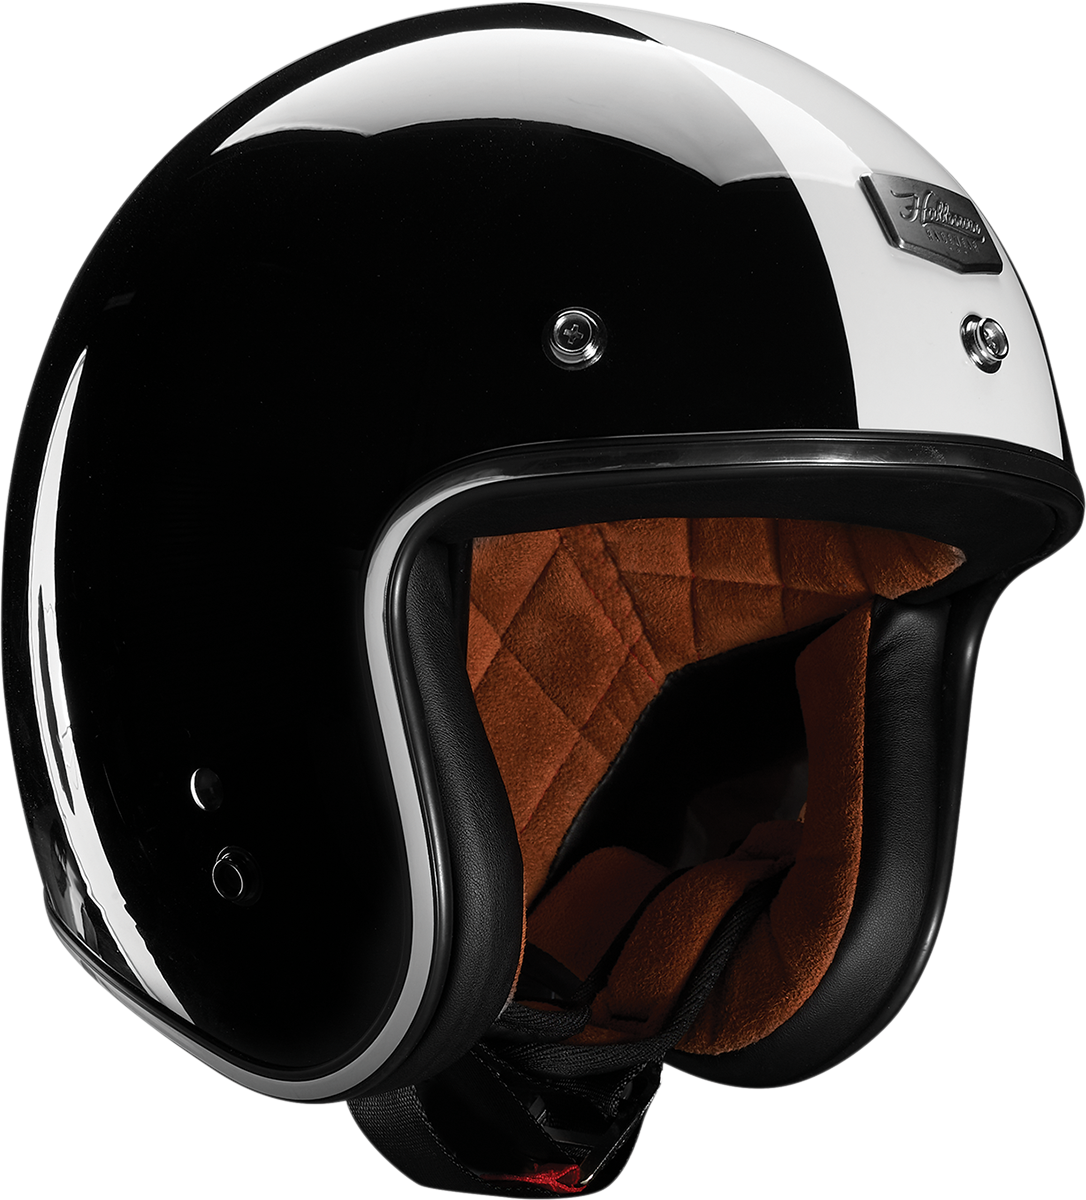 Thor Hallman Mccoy Open Face Black White Motorcycle Riding Street Helmet